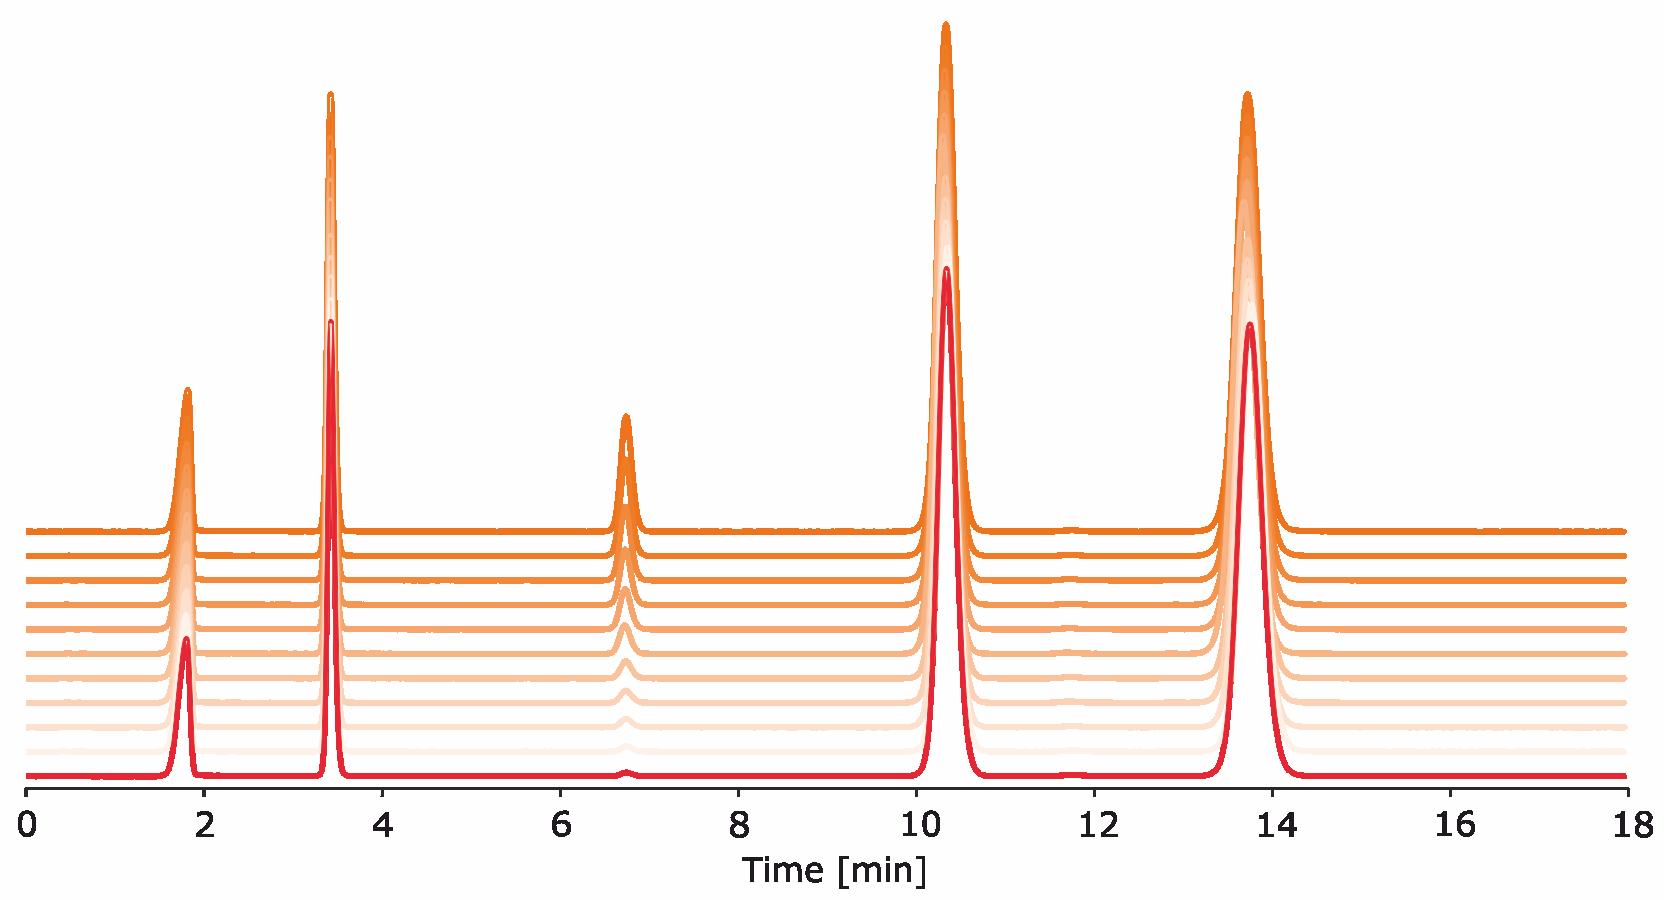 cromatogramas da hidrólise de um material C18